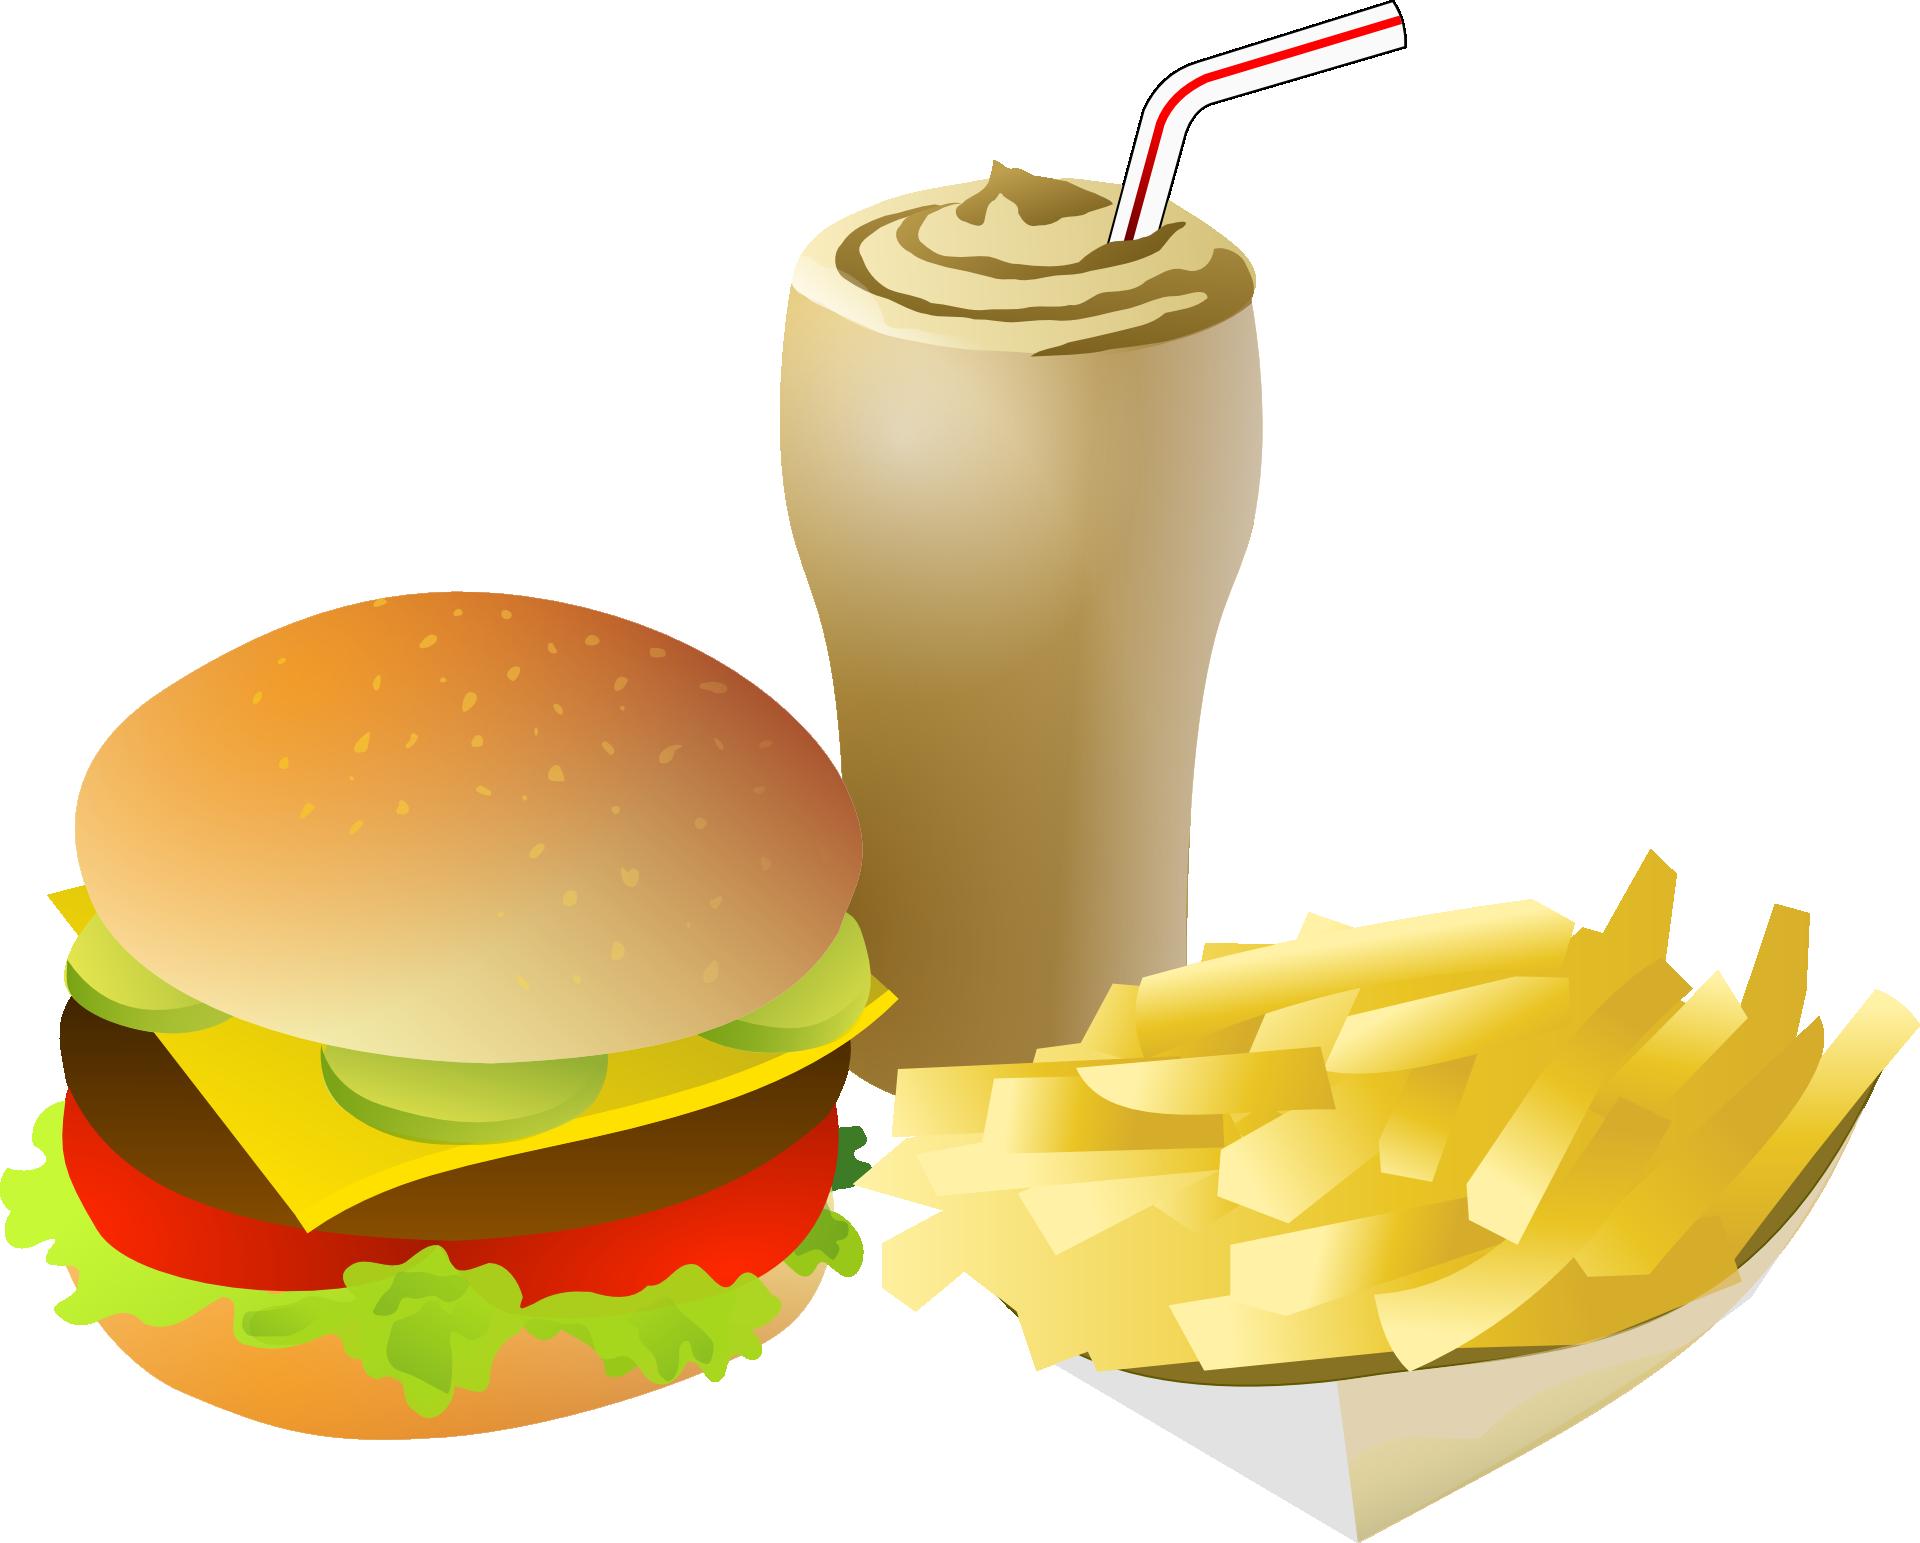 cheeseburger milkshake and fries